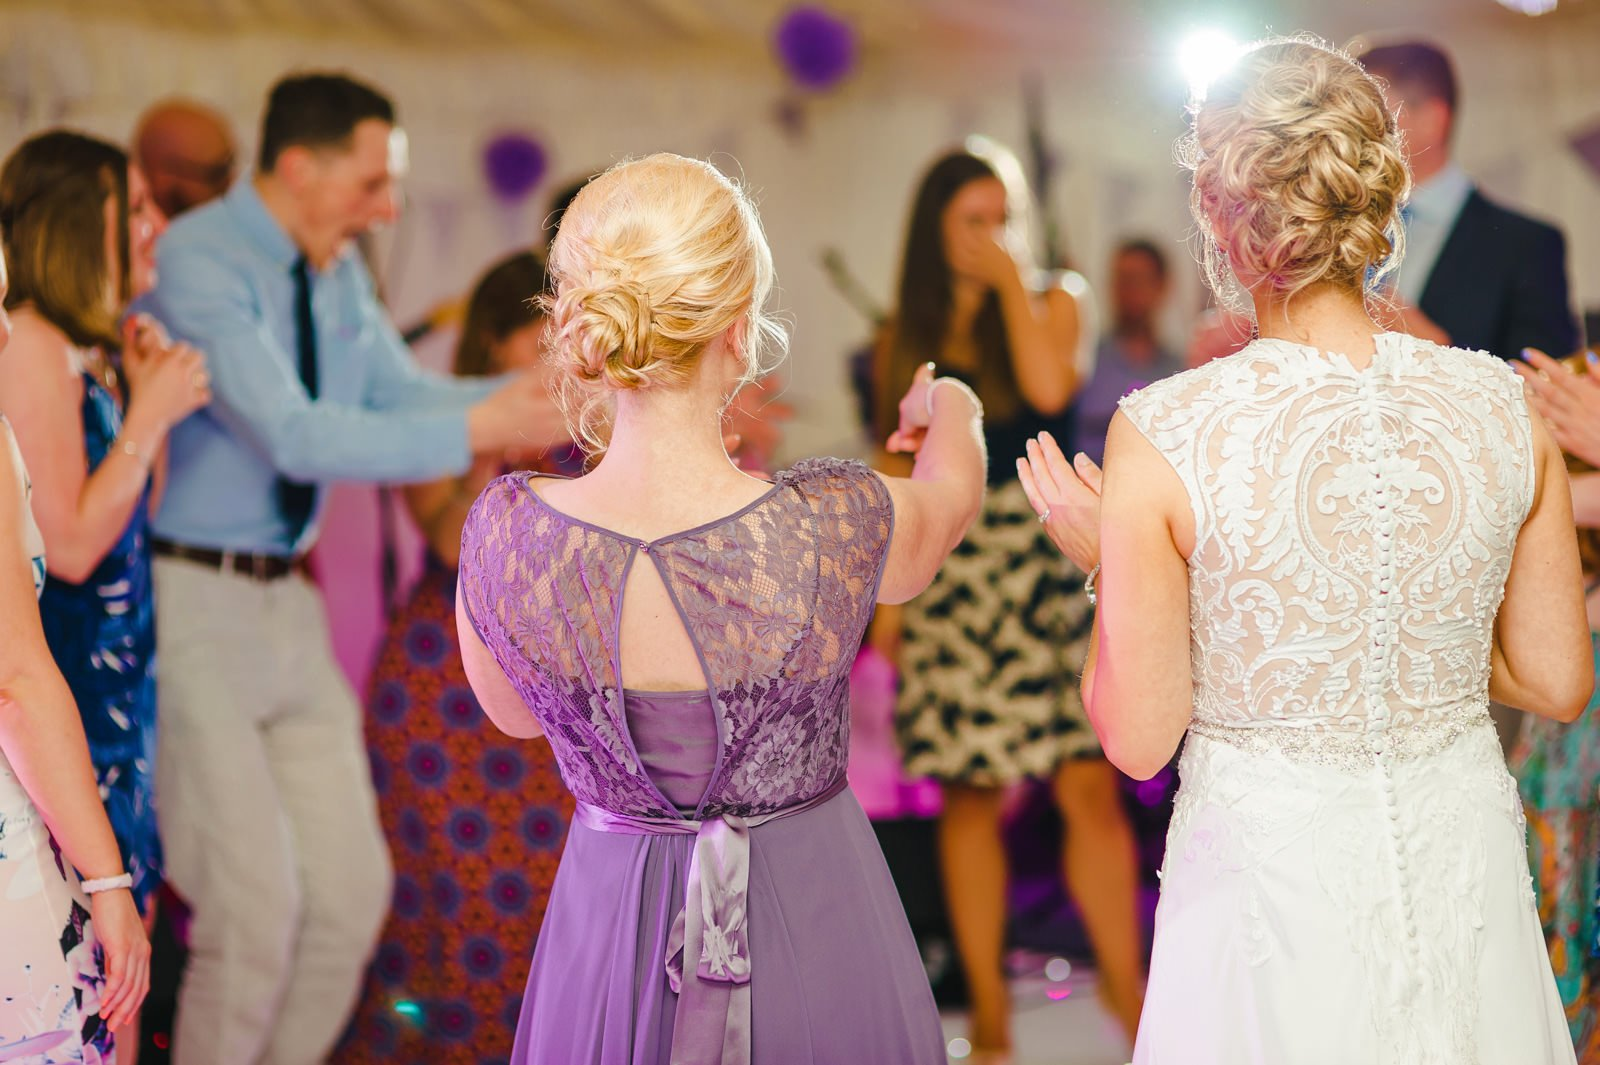 Millers Of Netley wedding, Dorrington, Shrewsbury | Emma + Ben 94